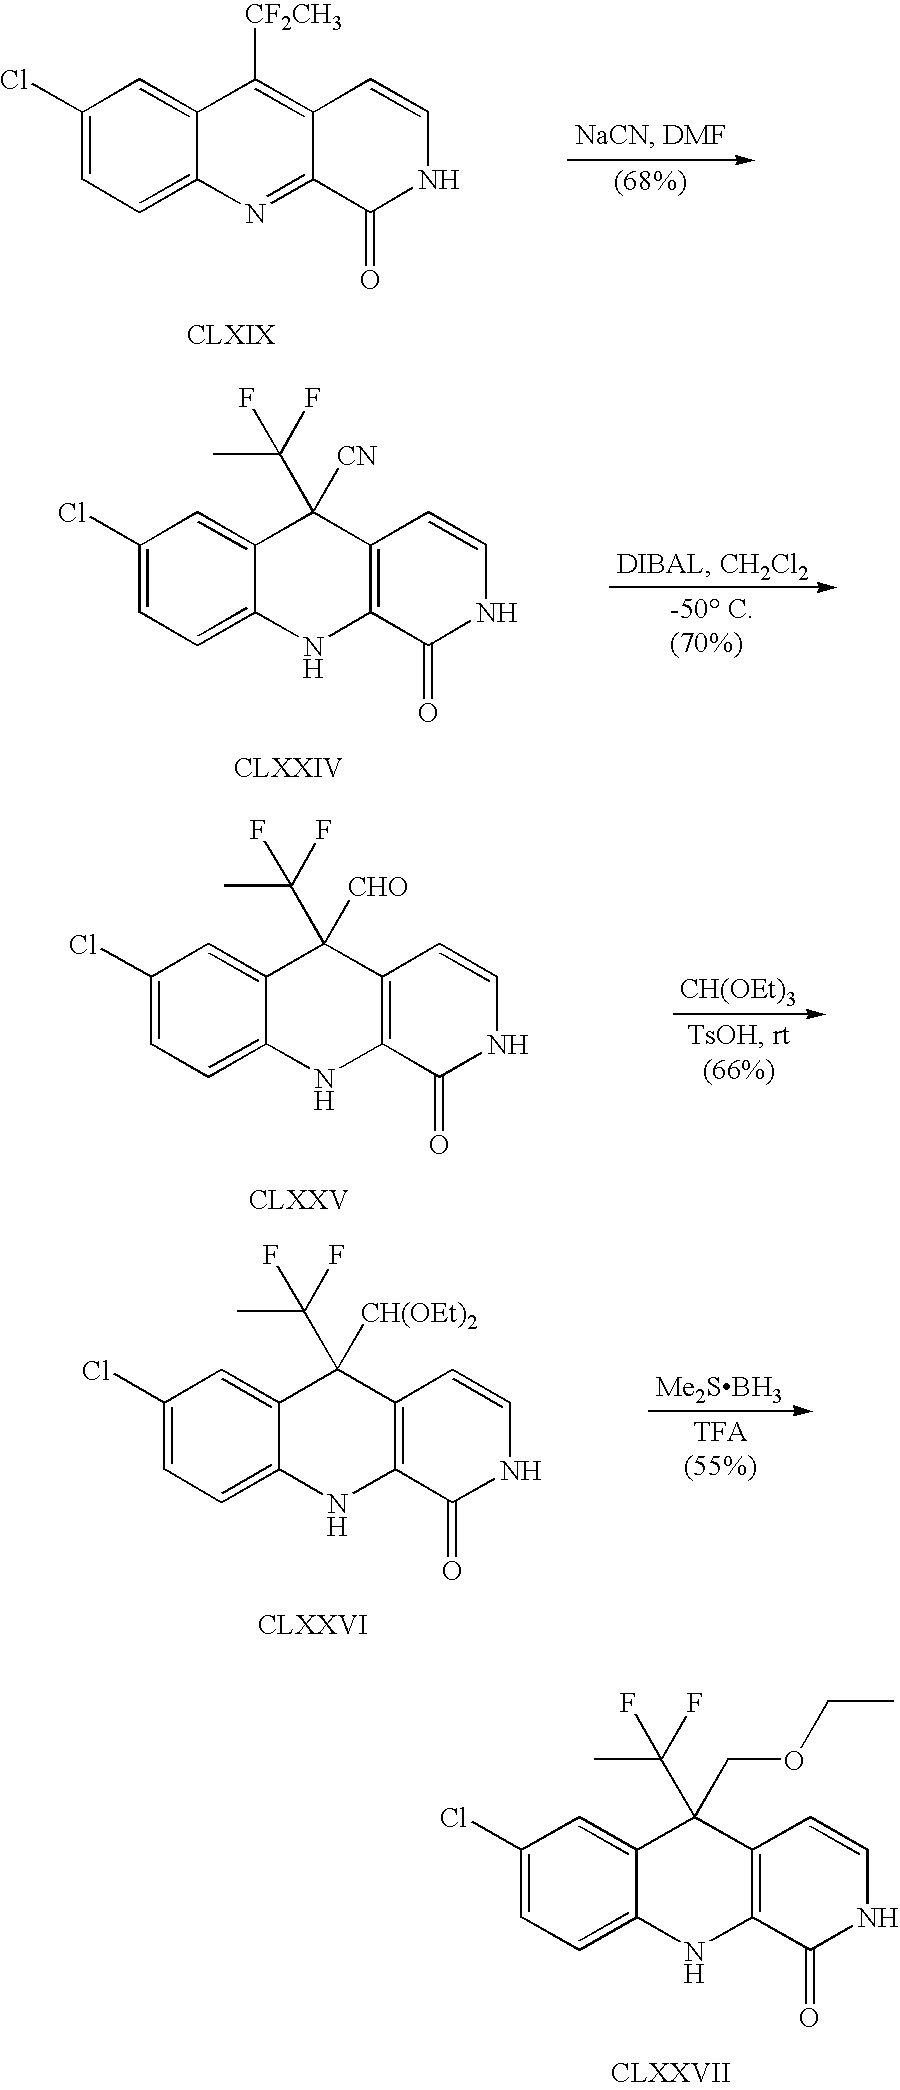 US6969721B2 - Tricyclic-2-pyridone compounds useful as HIV